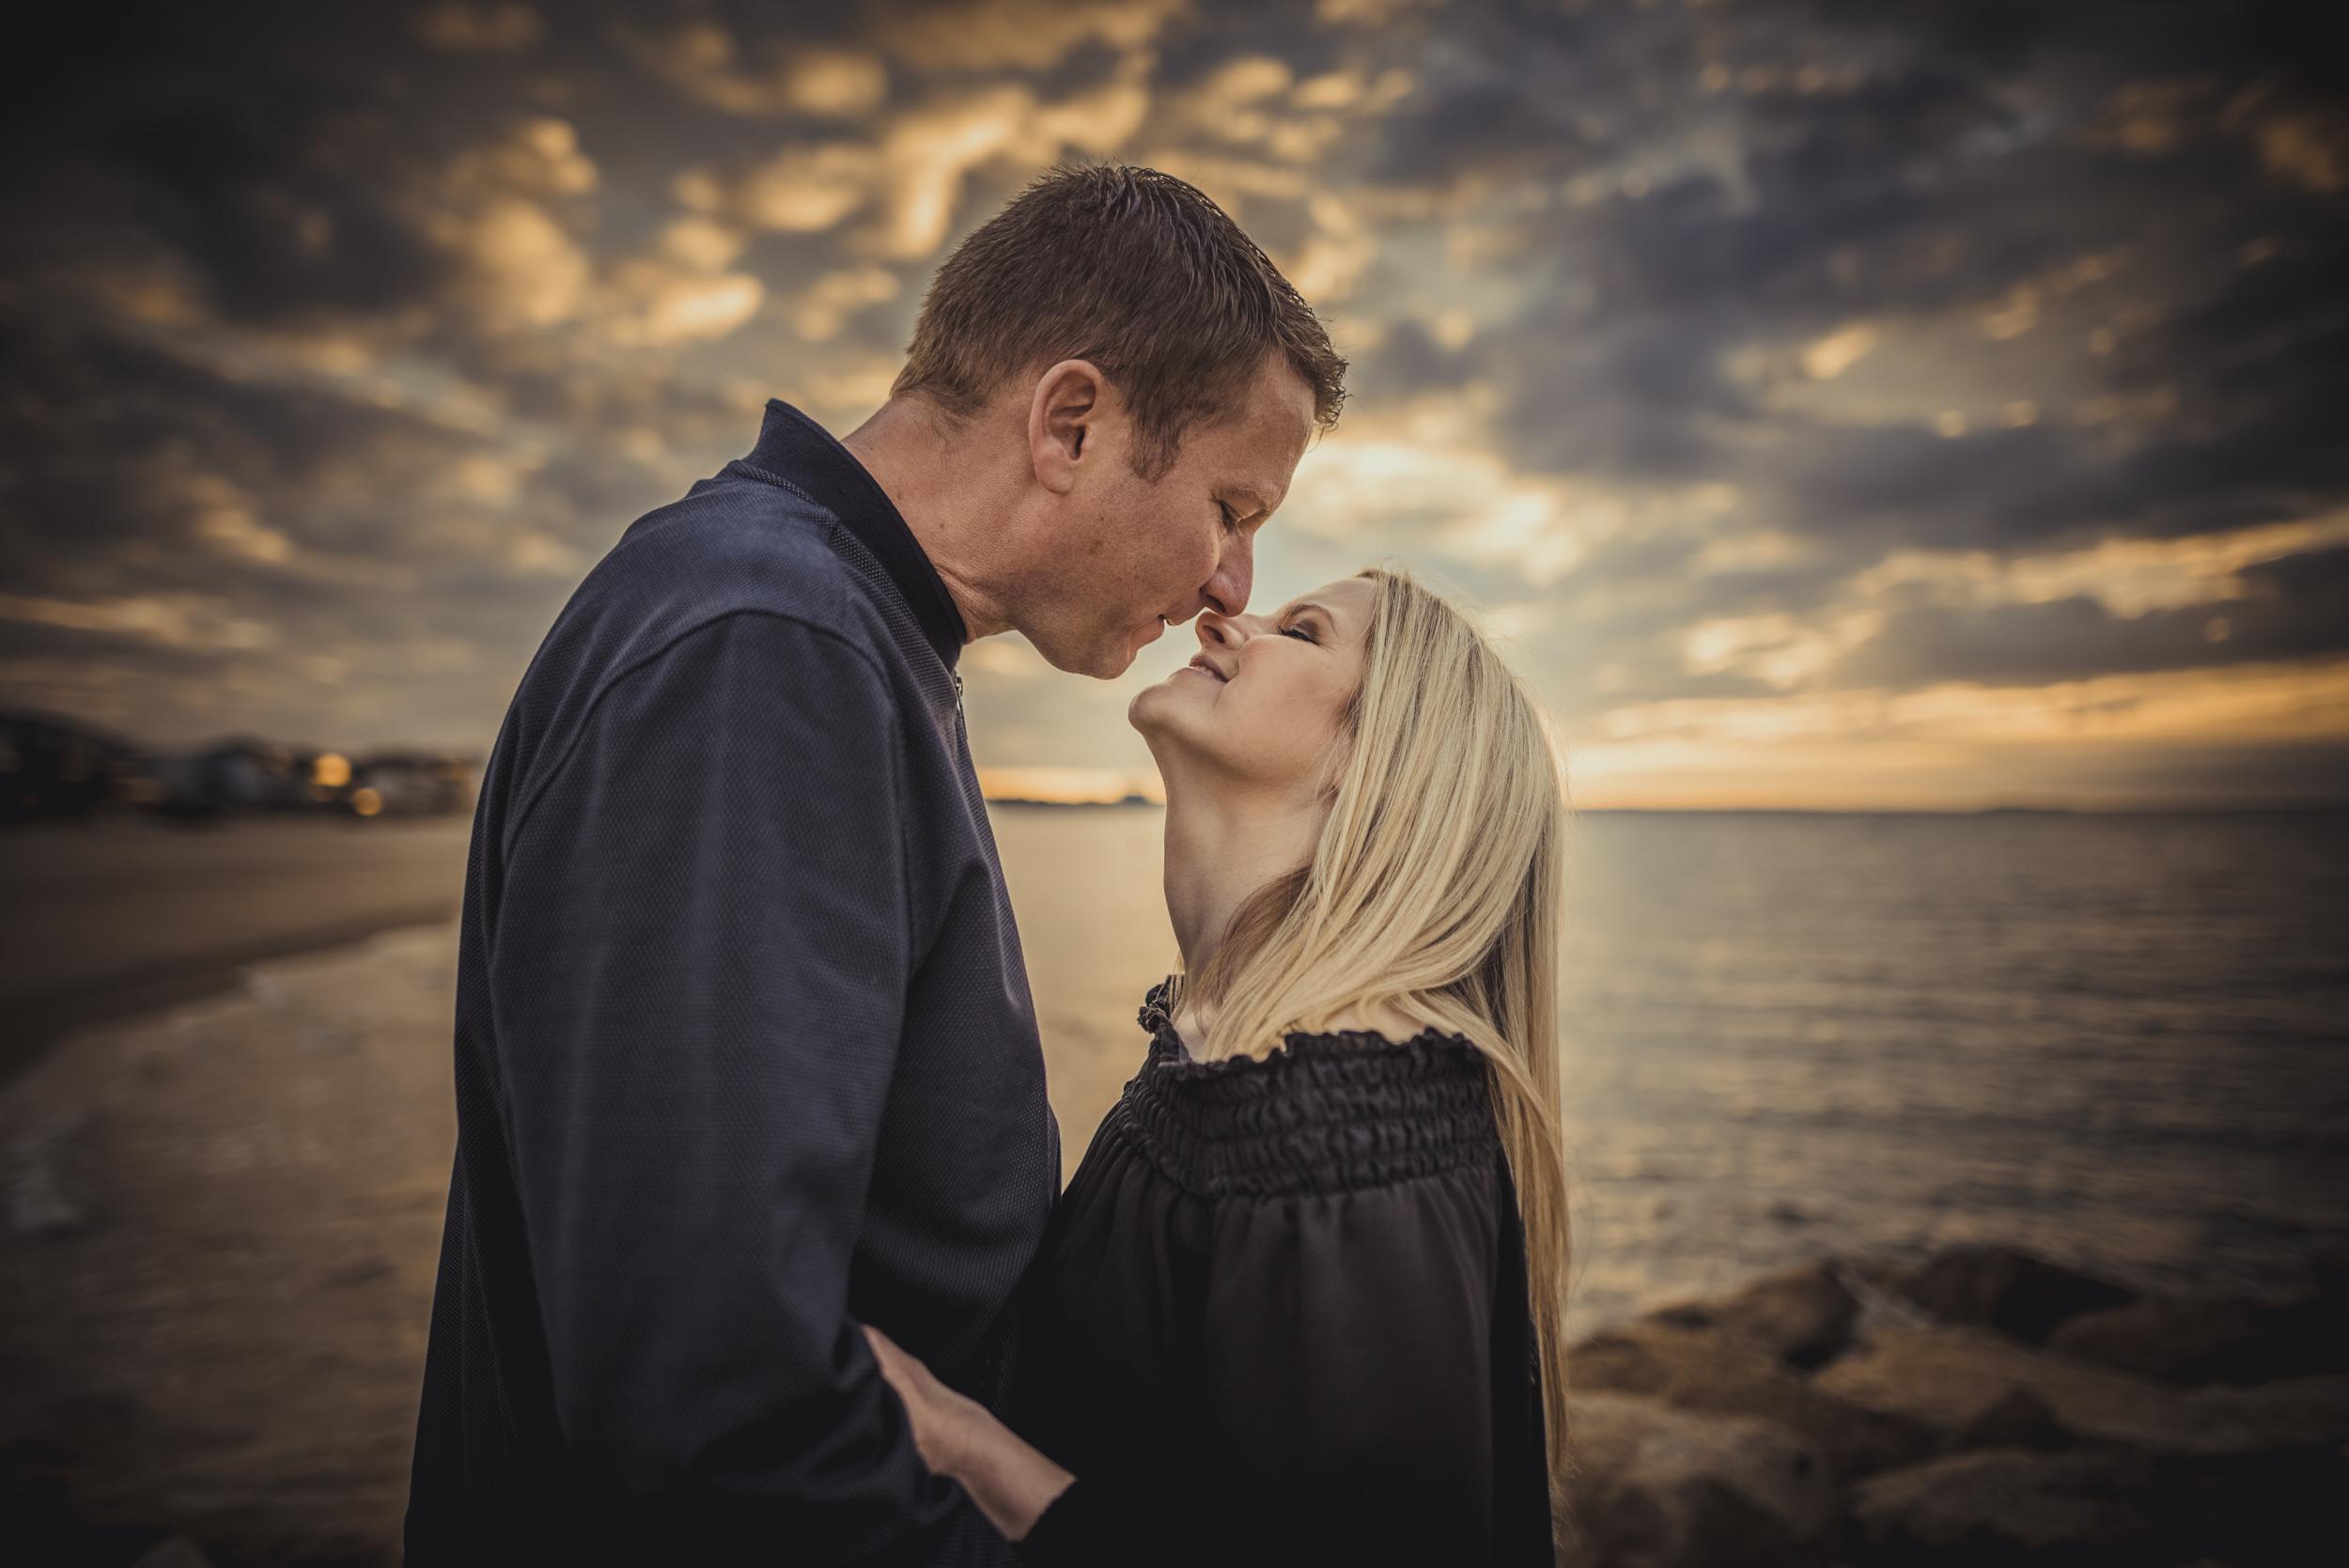 Trisha-and-Robert-Engagement-session-Sandbanks-beach-Poole-Manu-Mendoza-Wedding-Photography-022.jpg